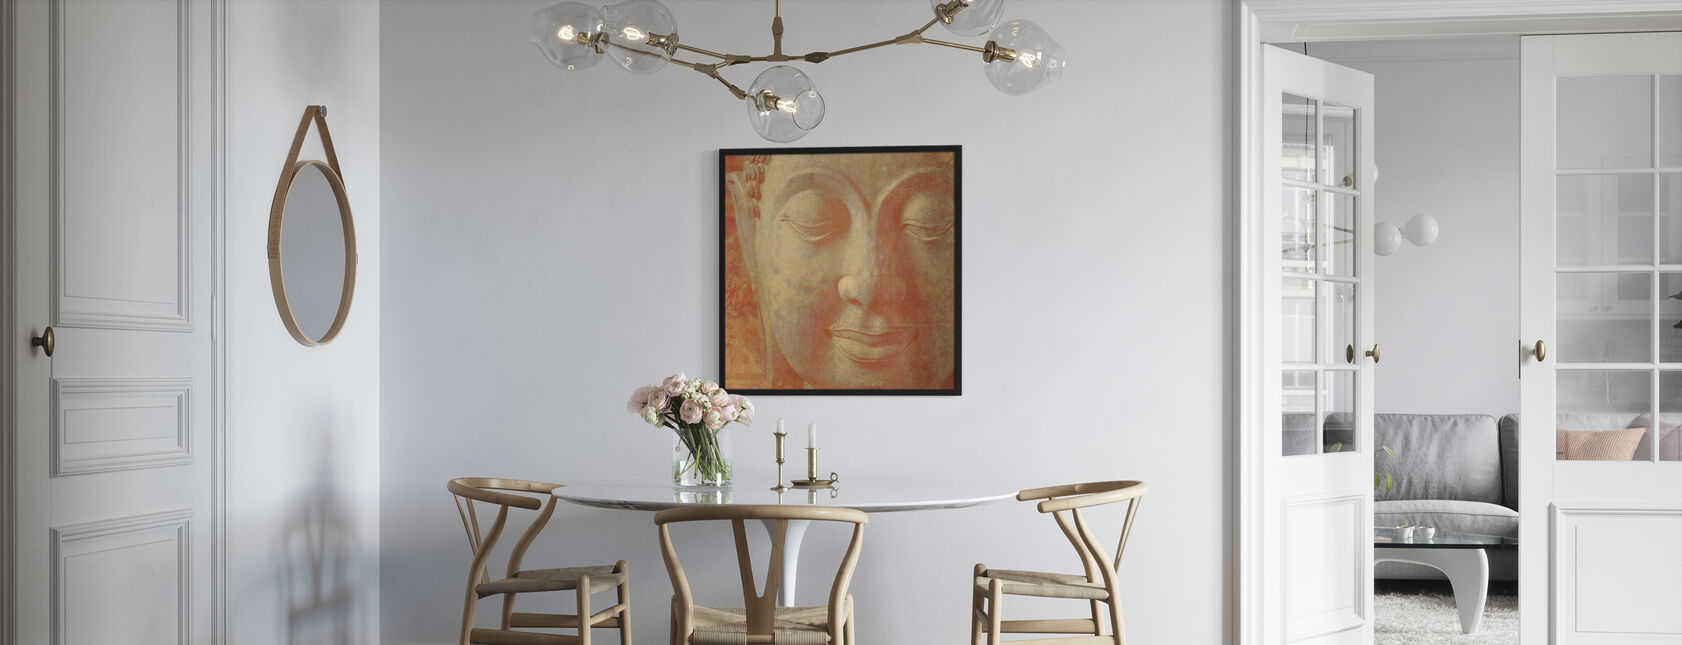 Szafran Budda kwadratu - Plakat - Kuchnia